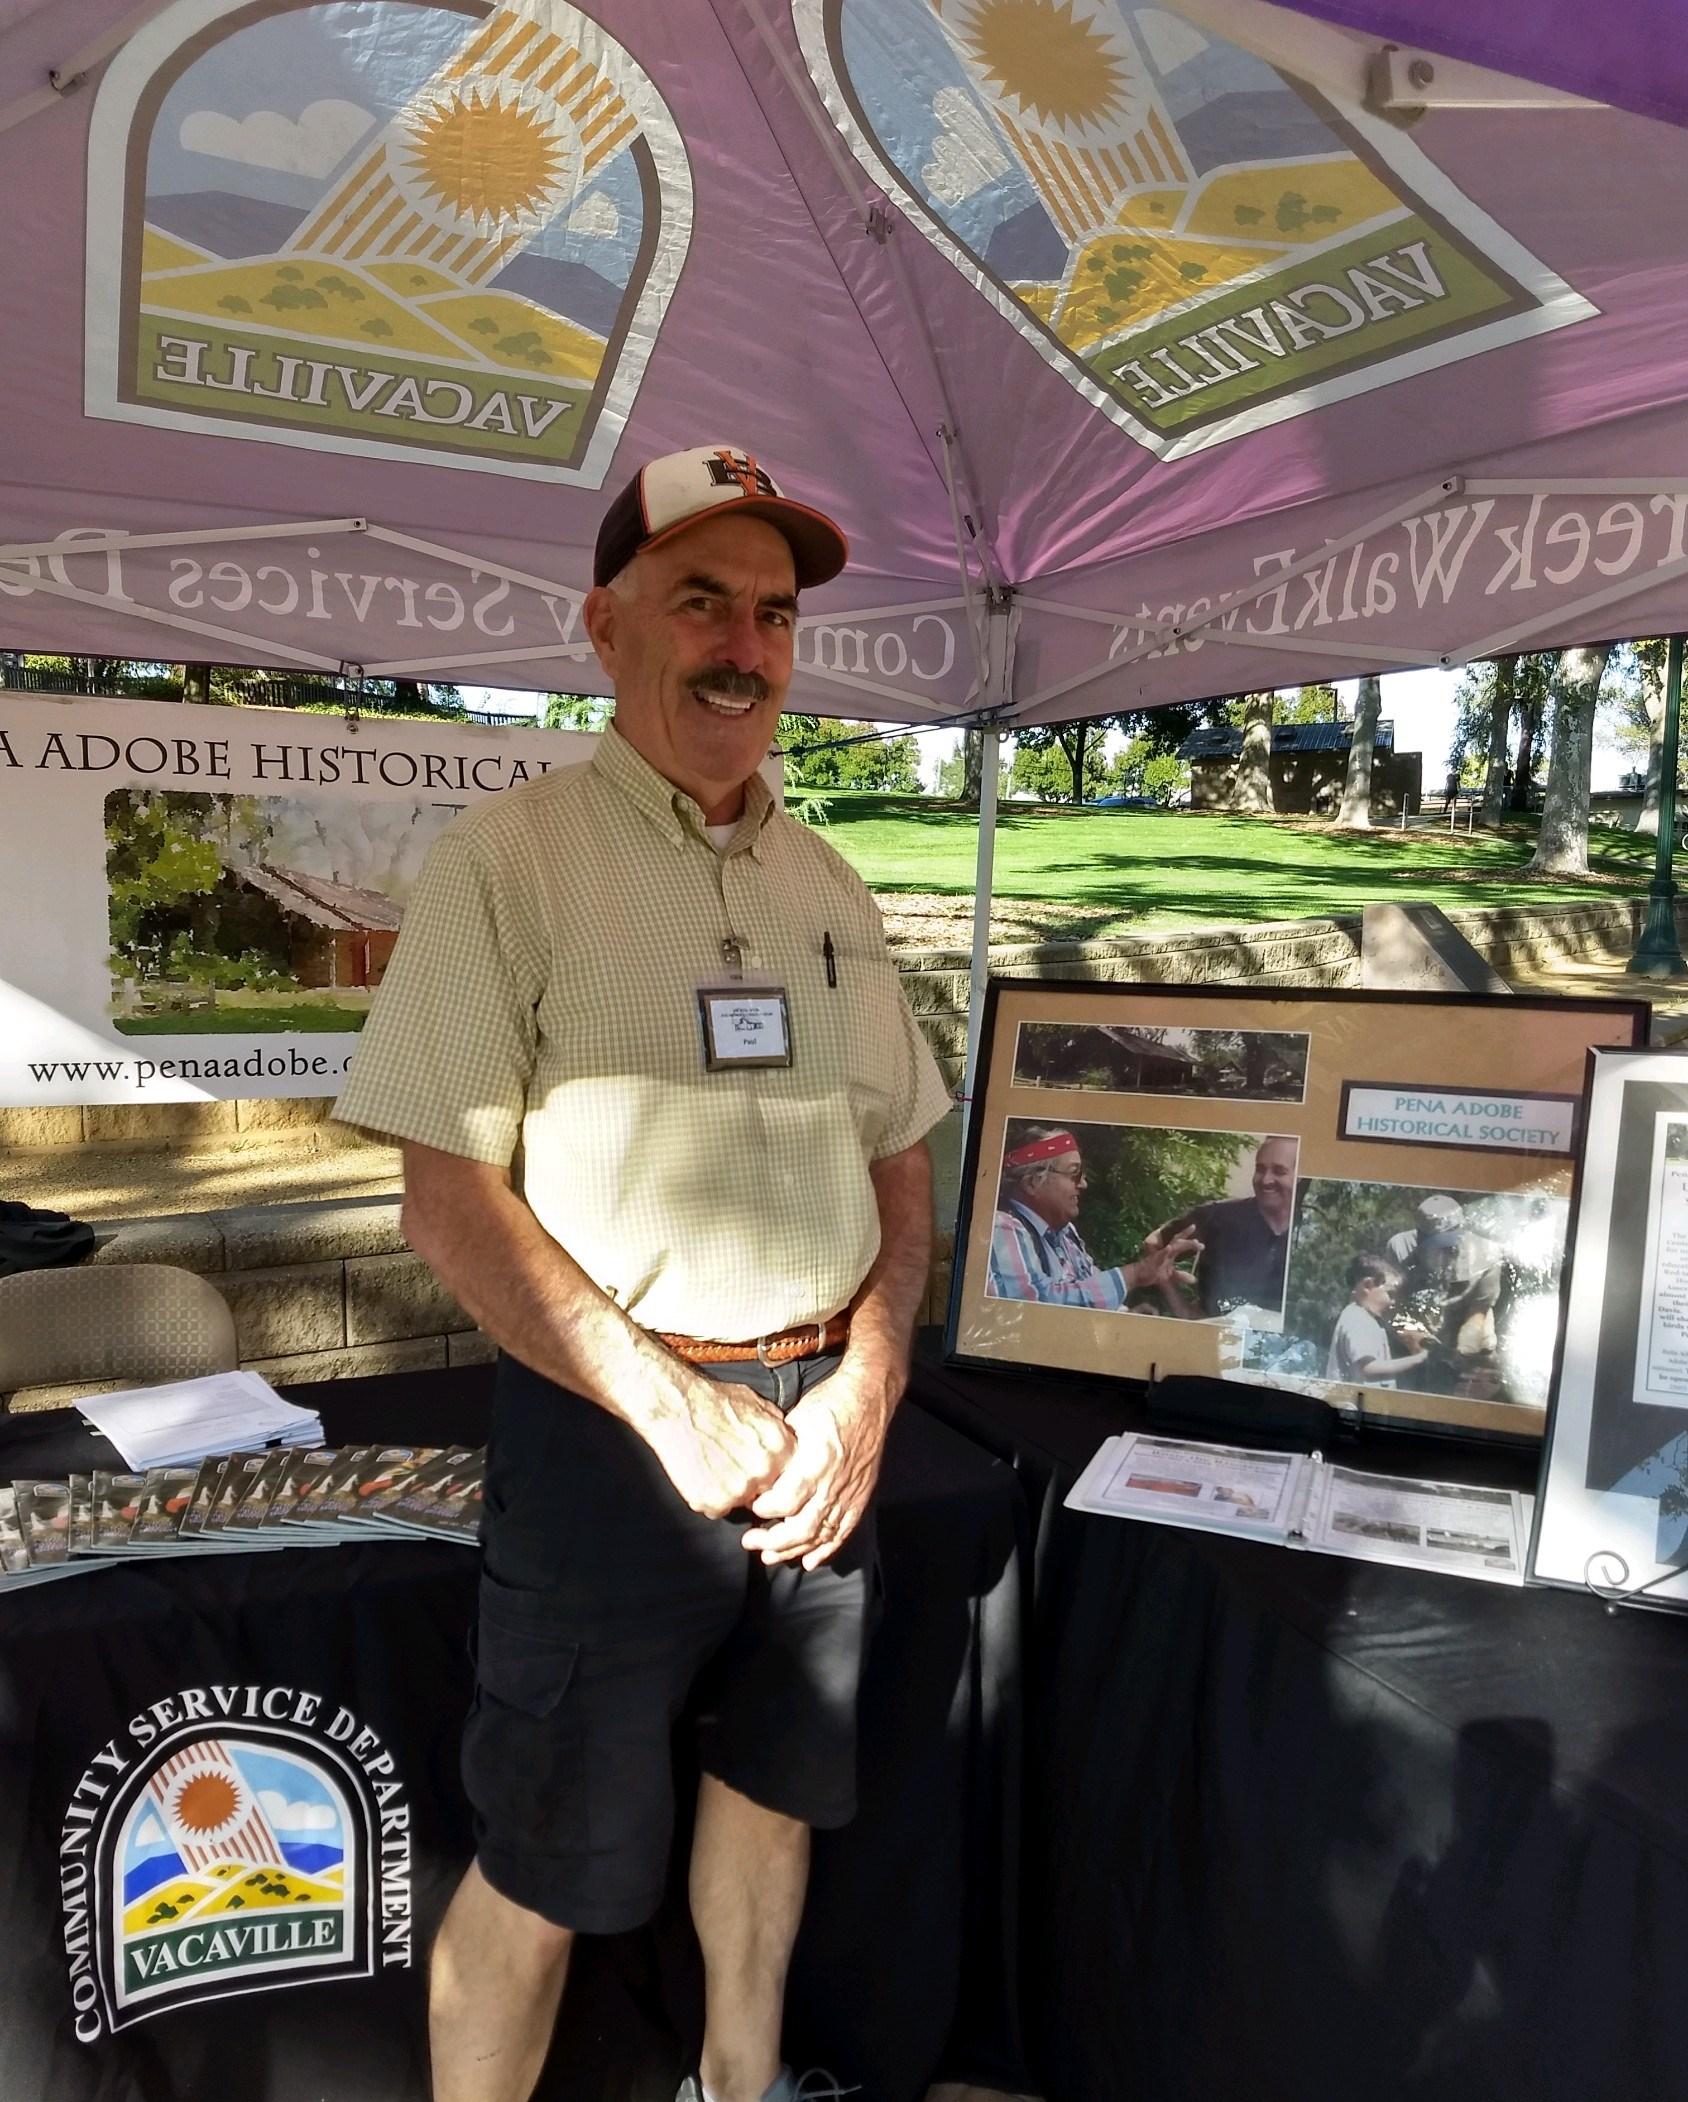 Peña Adobe Historical Society Volunteer, Paul Ahearn at Vacaville's 3rd Thursday Market!